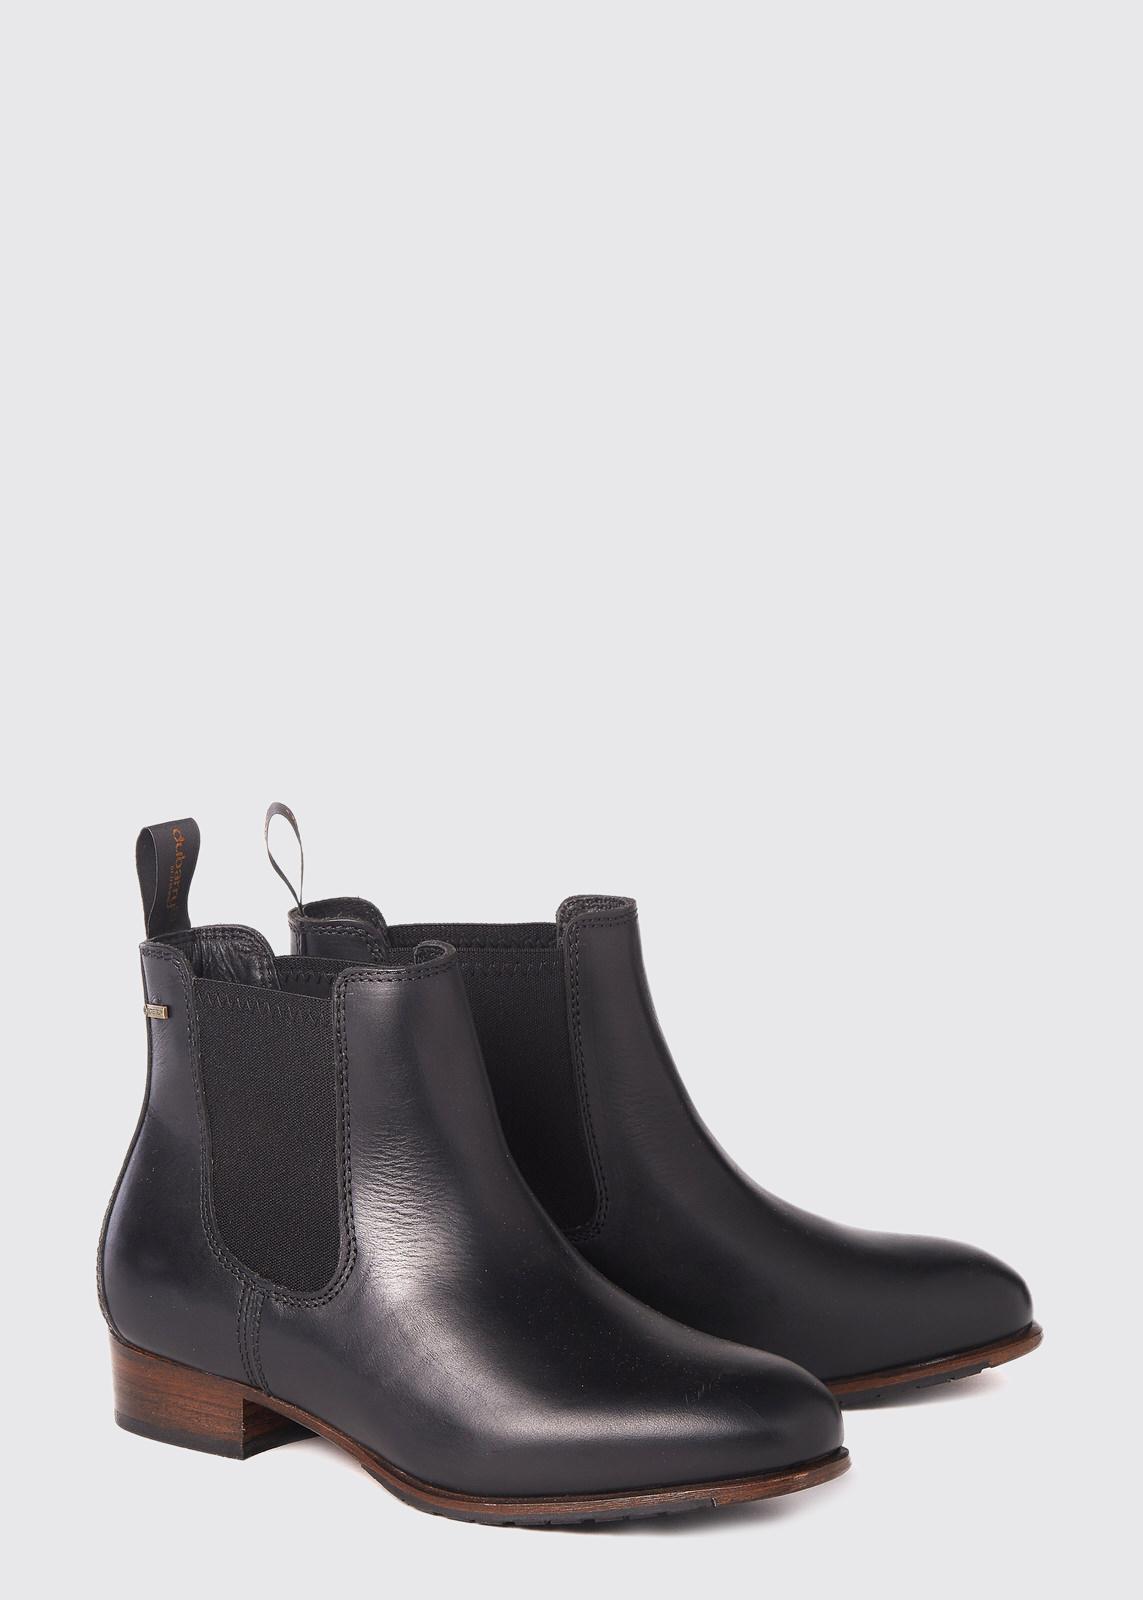 Cork Leather Soled Boot | Dubarry EU